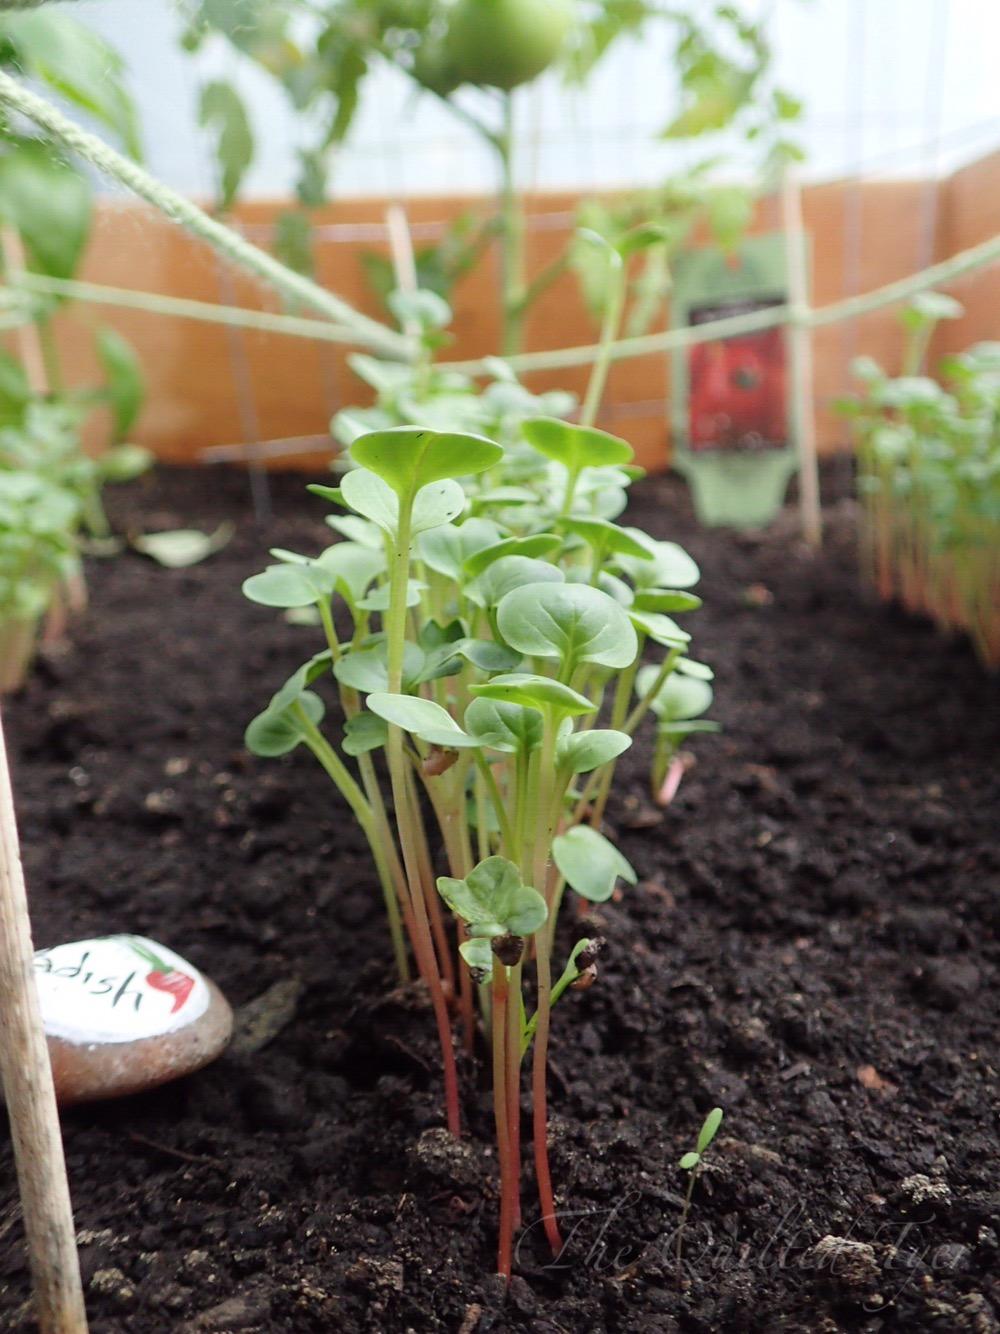 Grow little radishes grow!